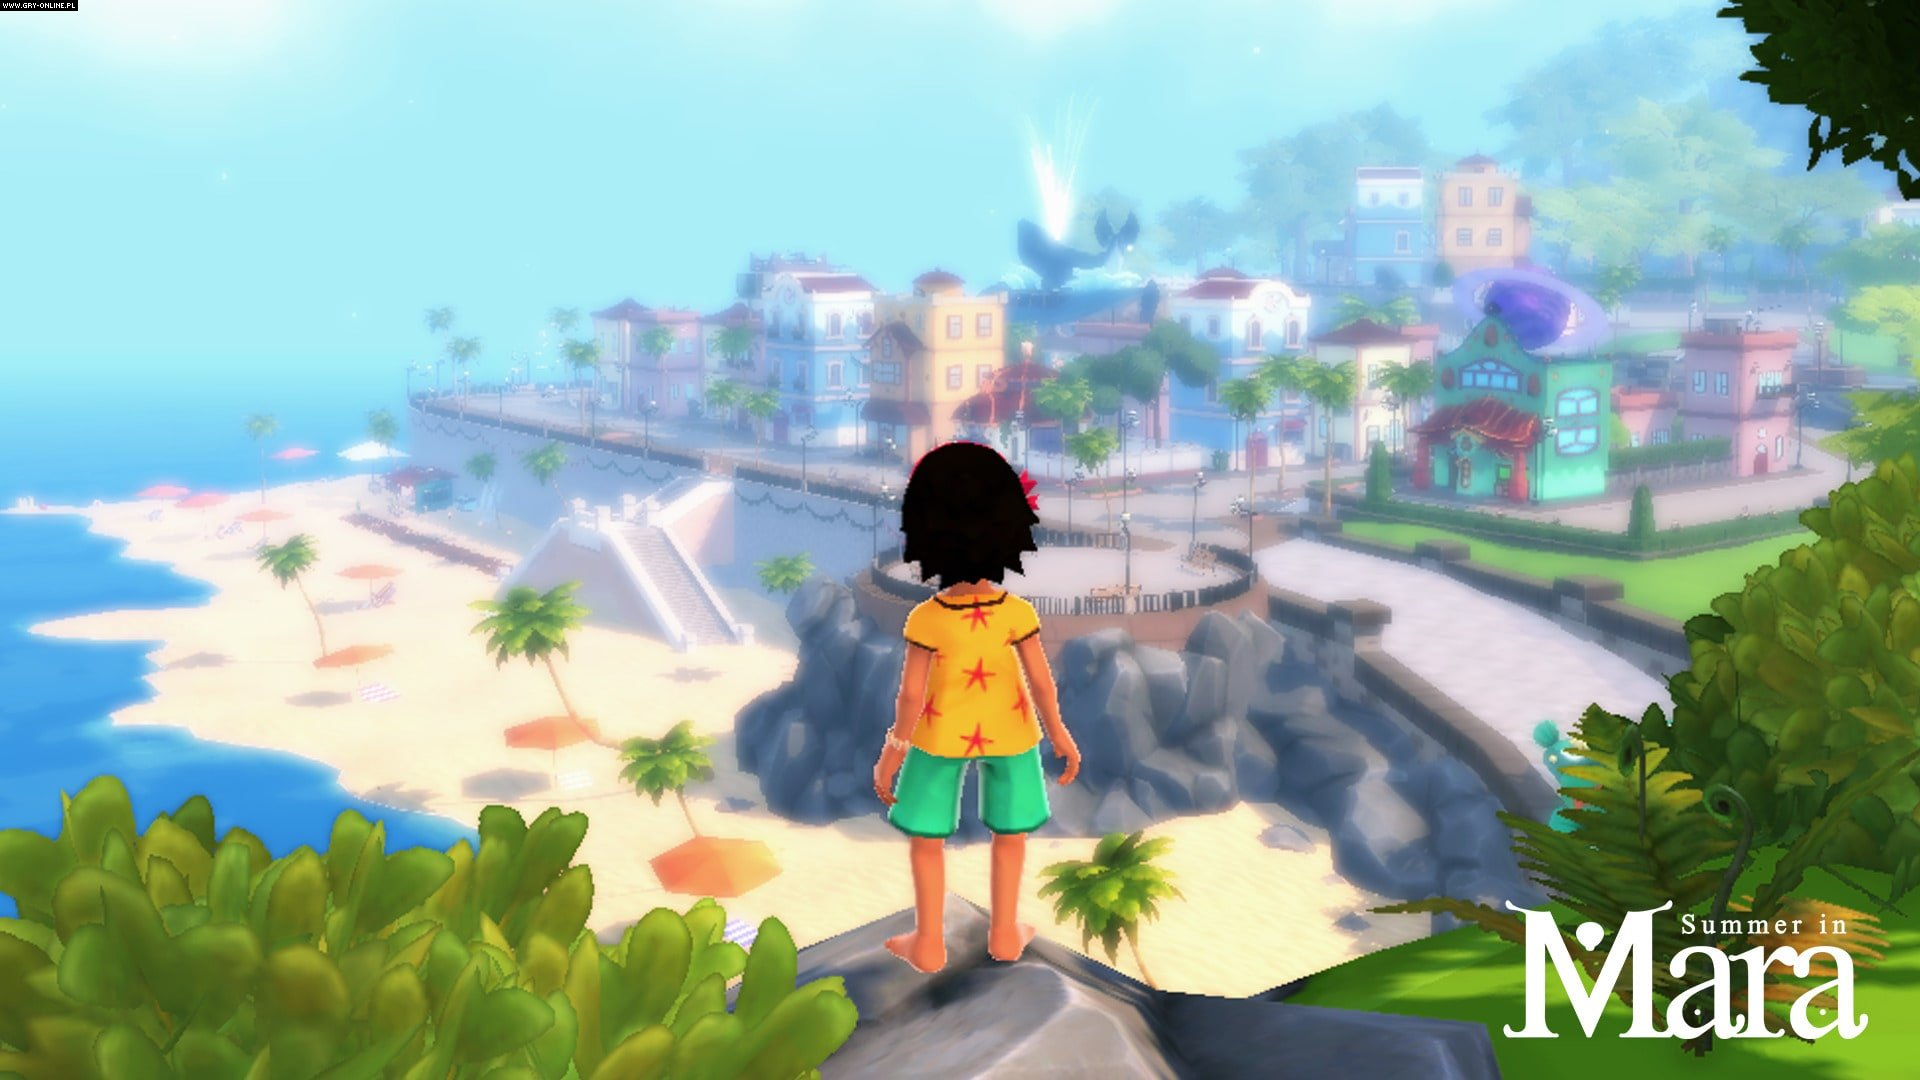 Summer in Mara PC Game game,